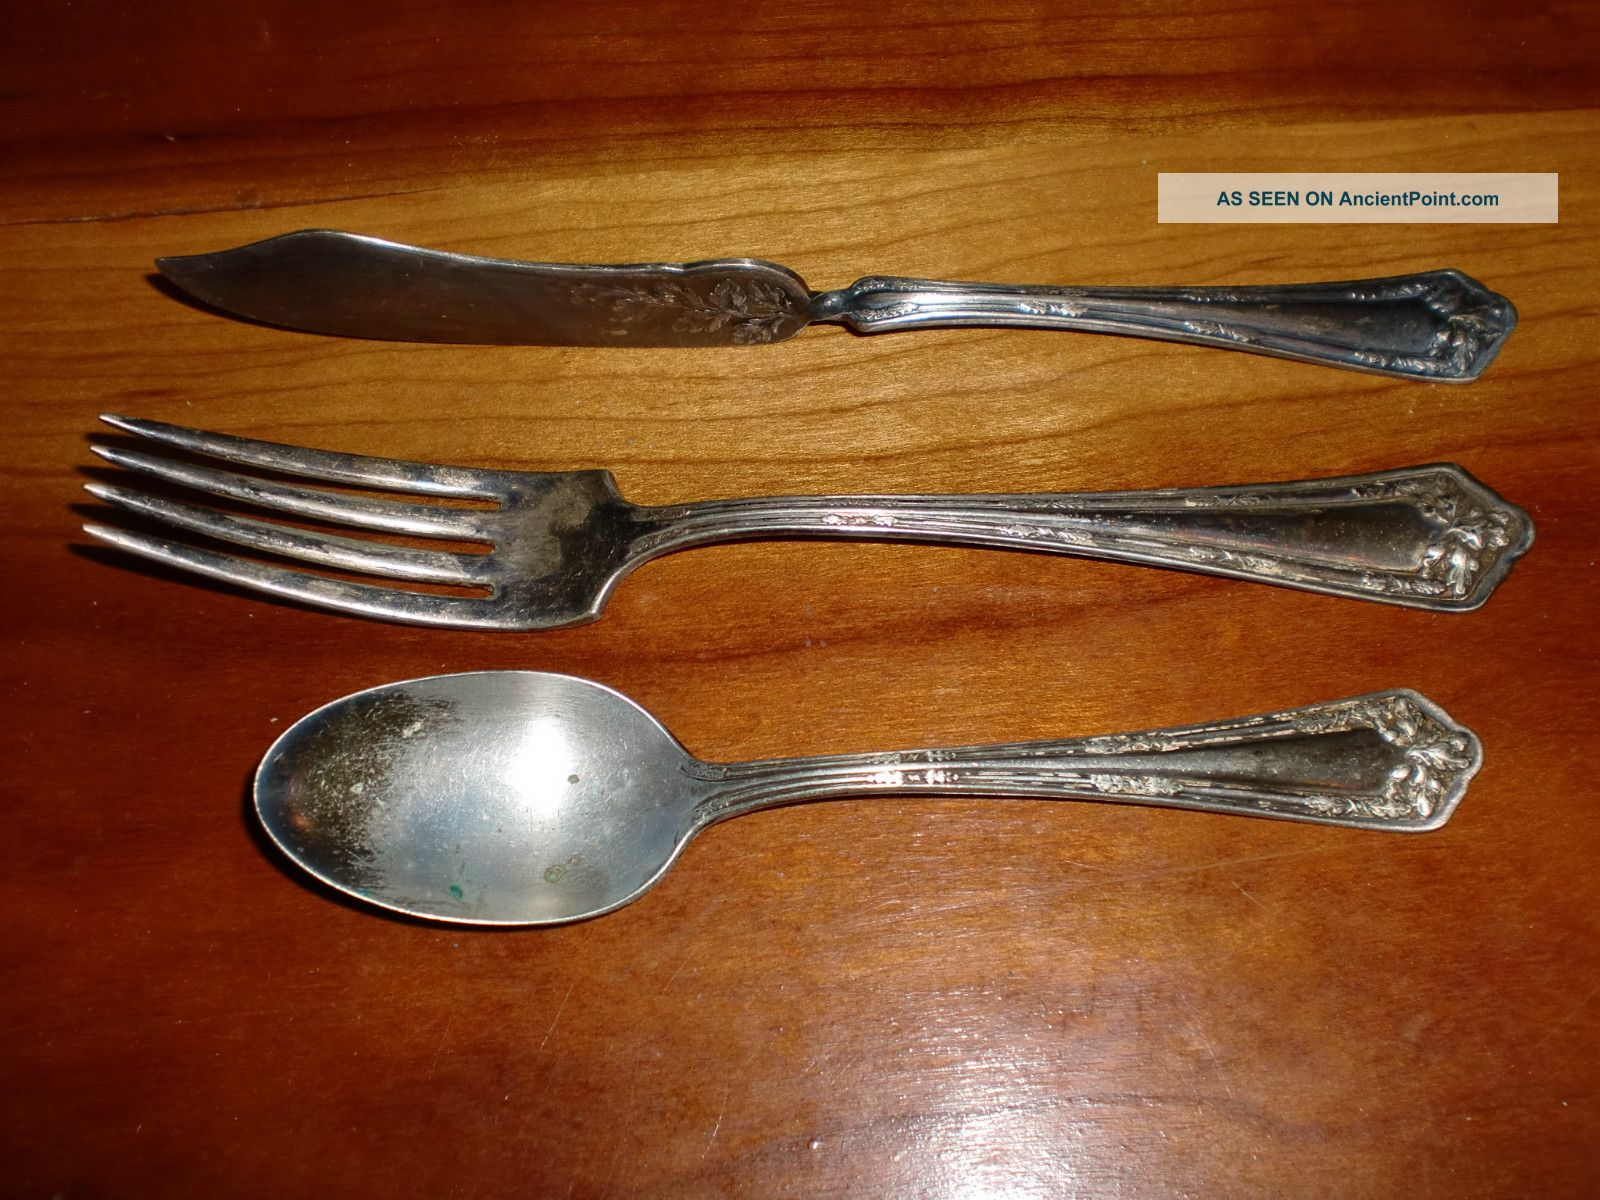 Antq Set Fork Spoon Knife Int ' L Wm Rogers & Sons Aa Silverplate 1913 Fair Oak International/1847 Rogers photo